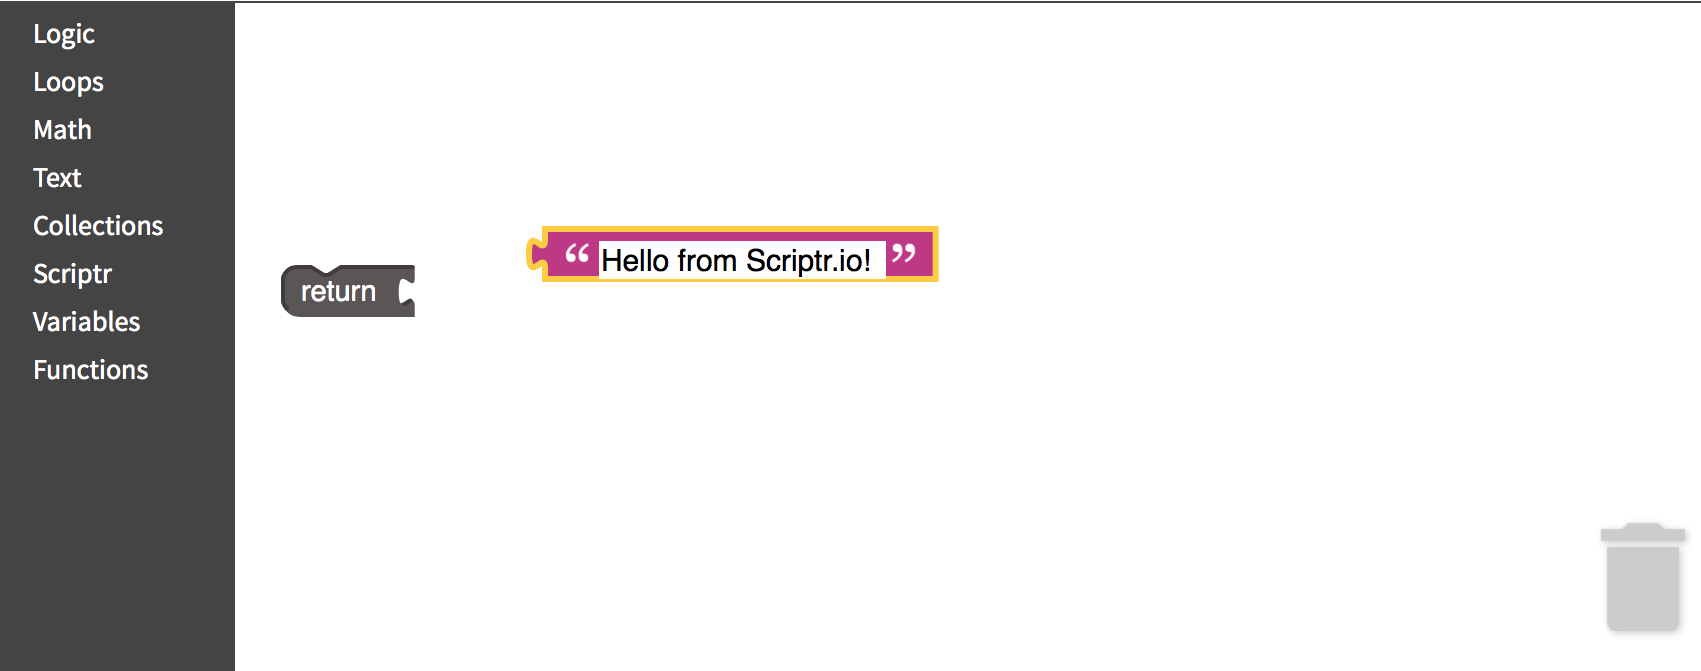 editor_addingtext